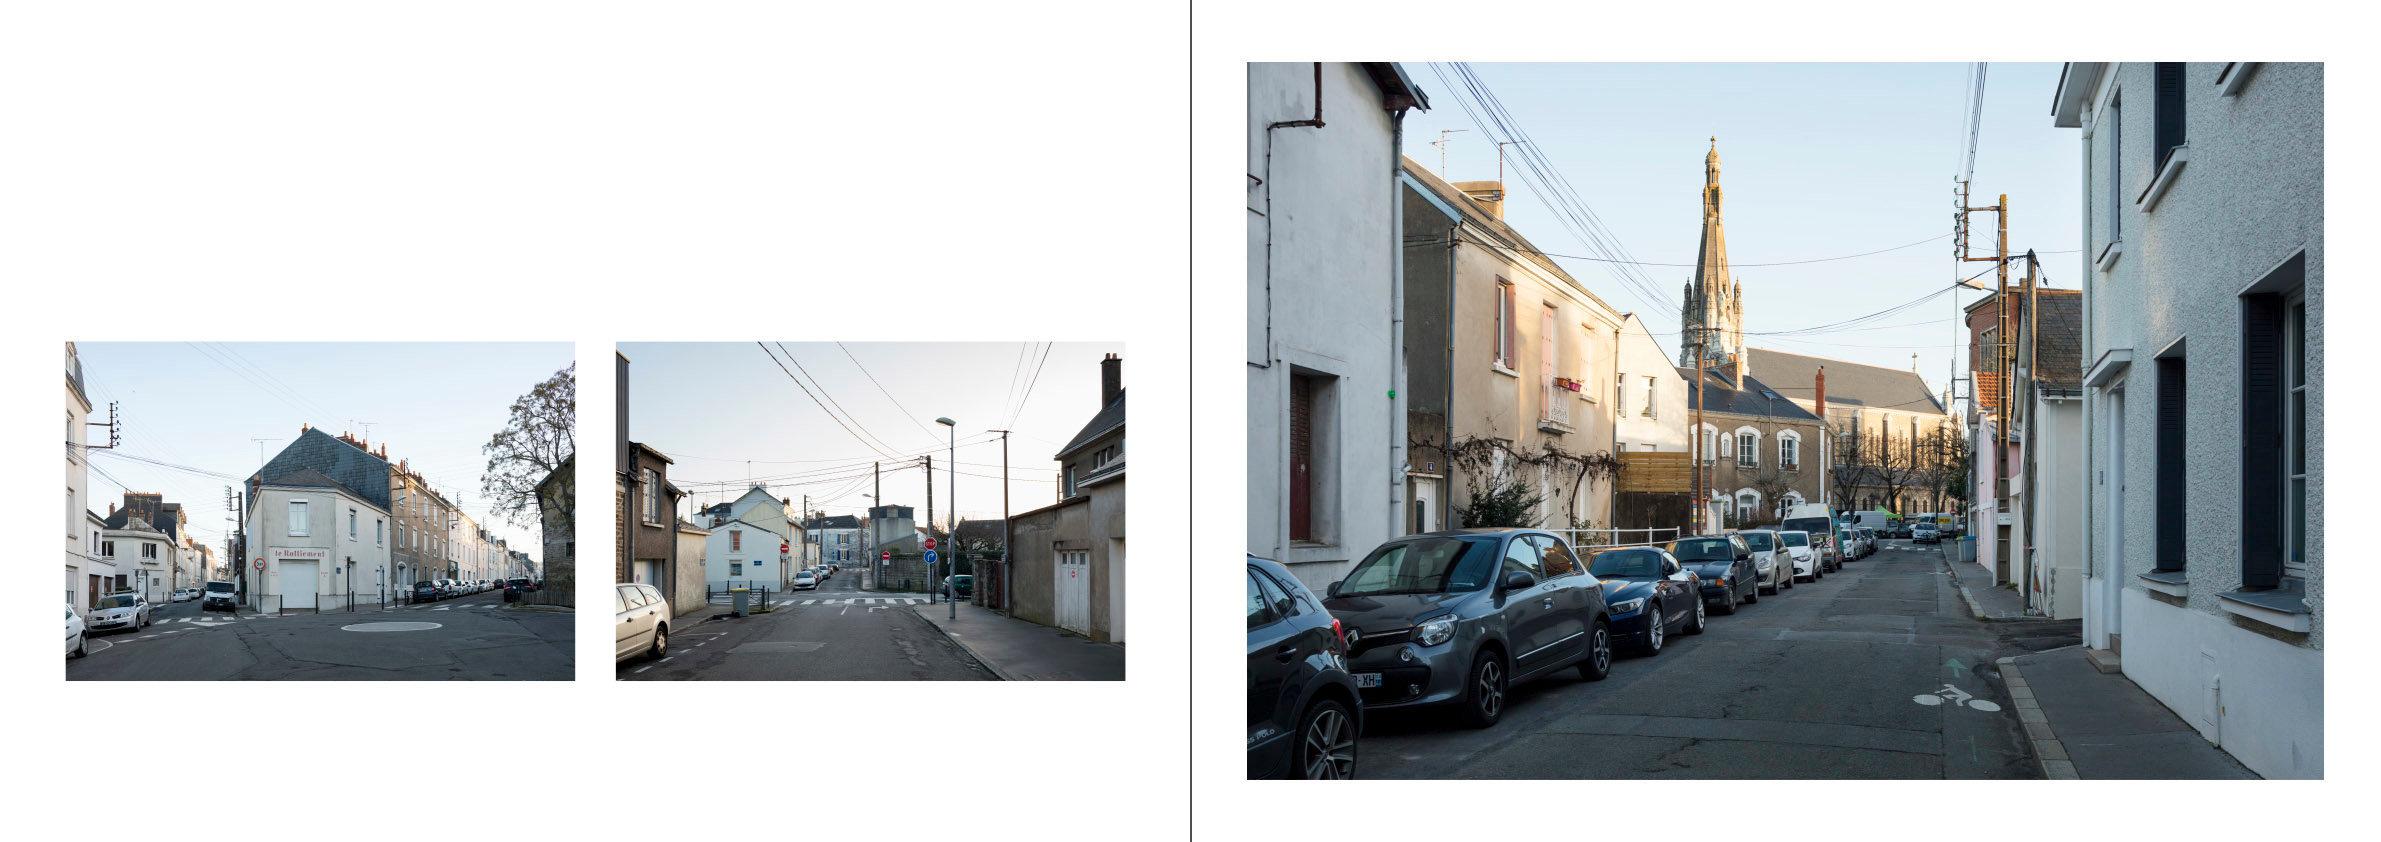 Nantes-Carquefou-Ste Luce A3-page009.jpeg